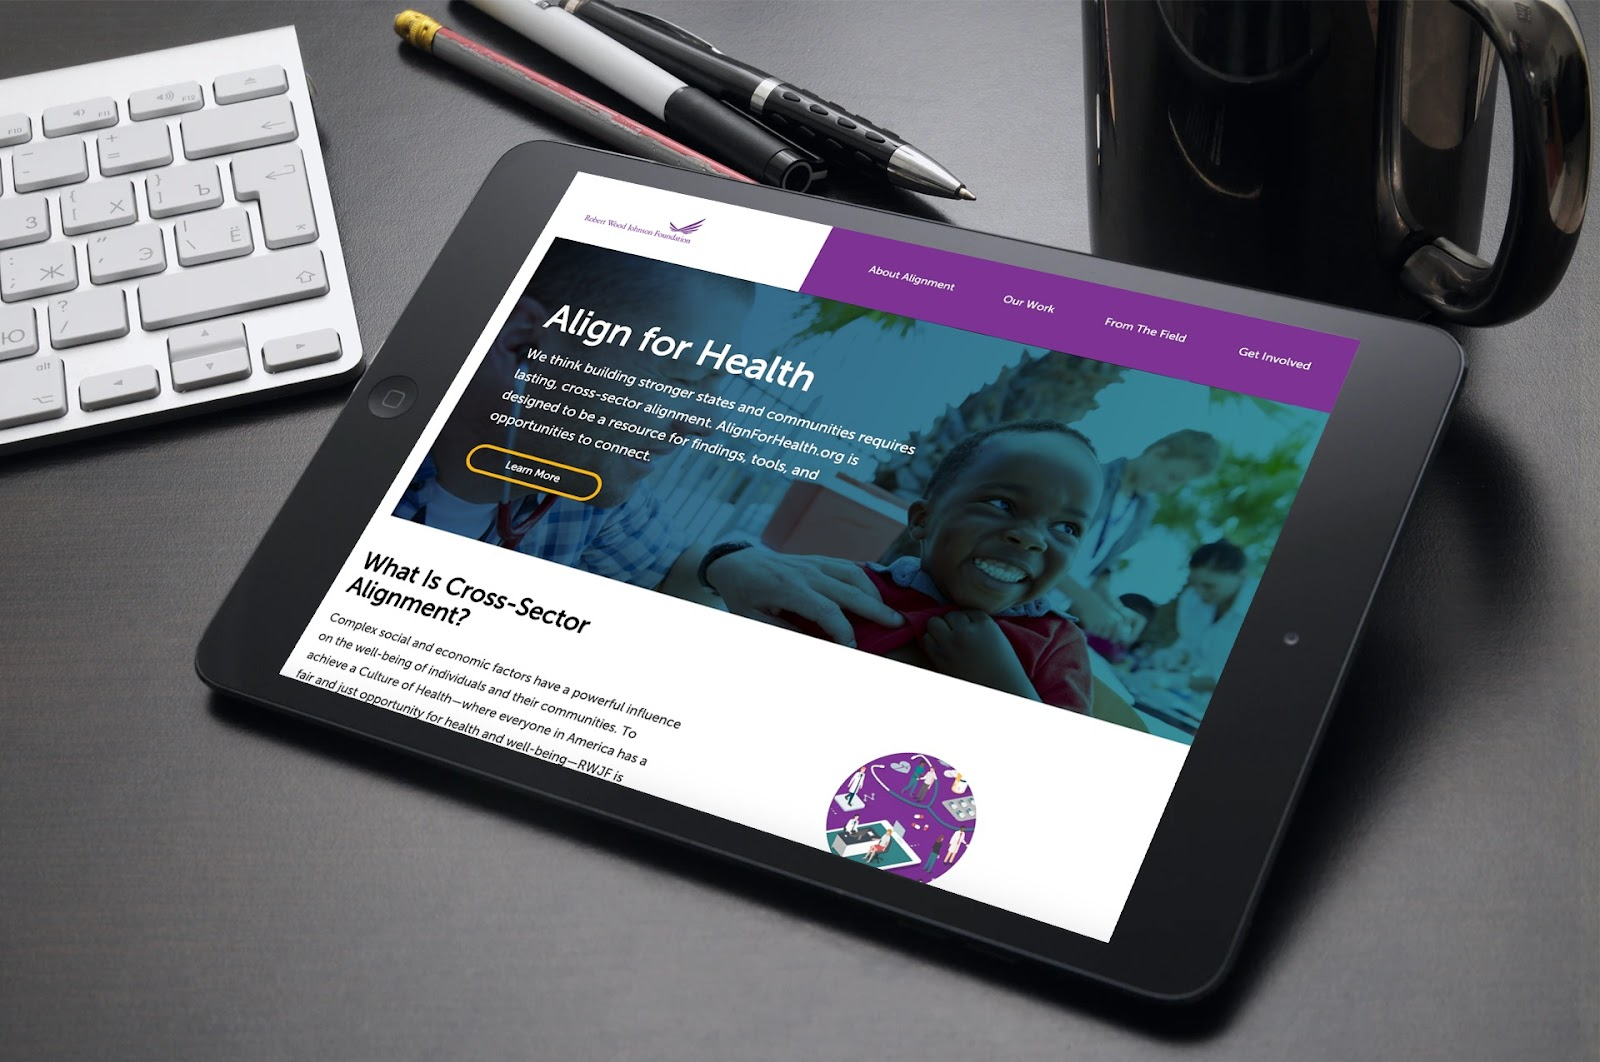 Robert Wood Johnson Foundation's Align for Health